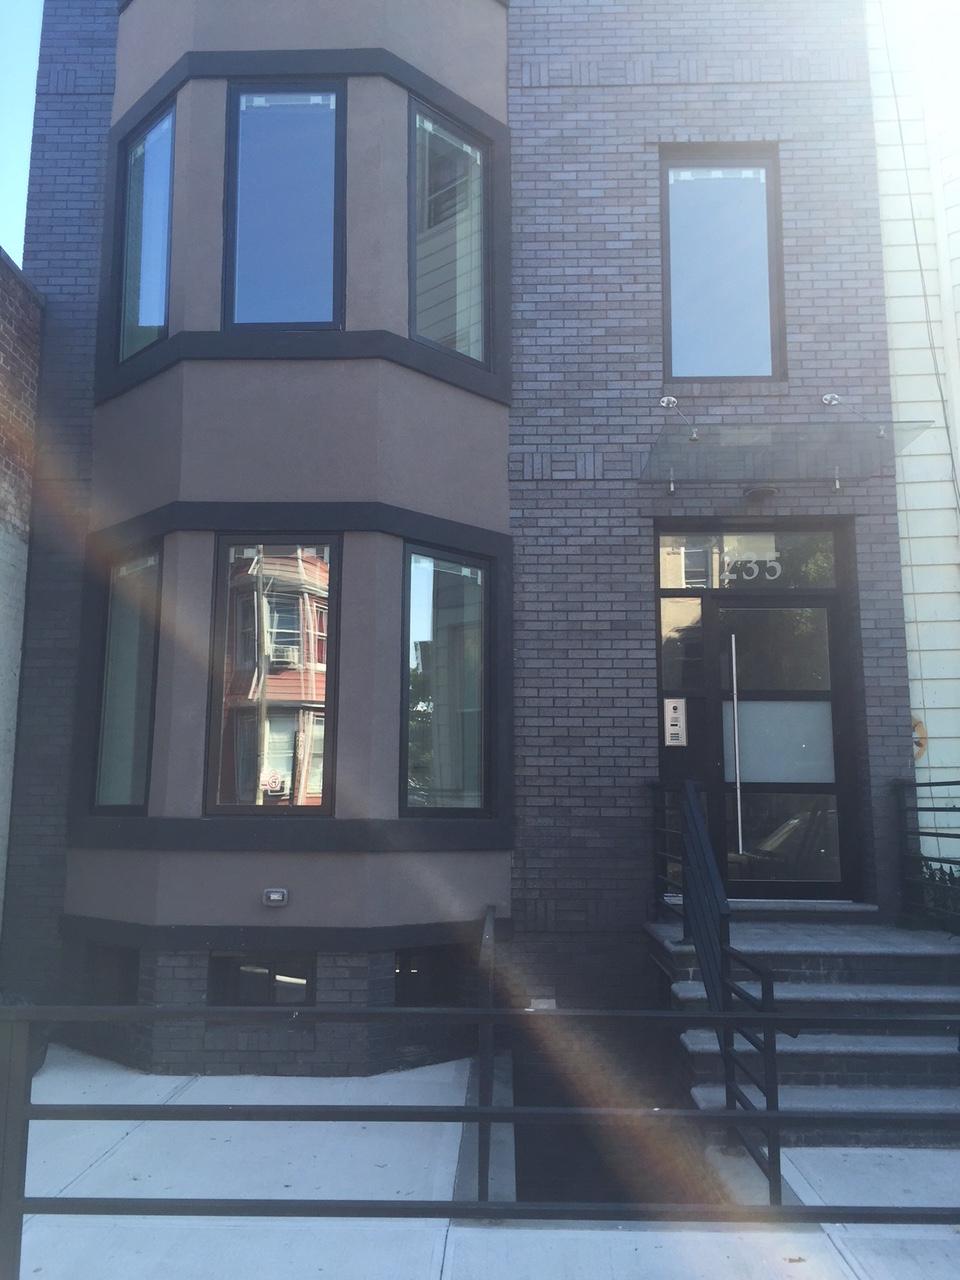 235 51st street,brooklyn,kings,New York,United States 11220,3 Bedrooms Bedrooms,2.5 BathroomsBathrooms,Apartment,51st street ,1053